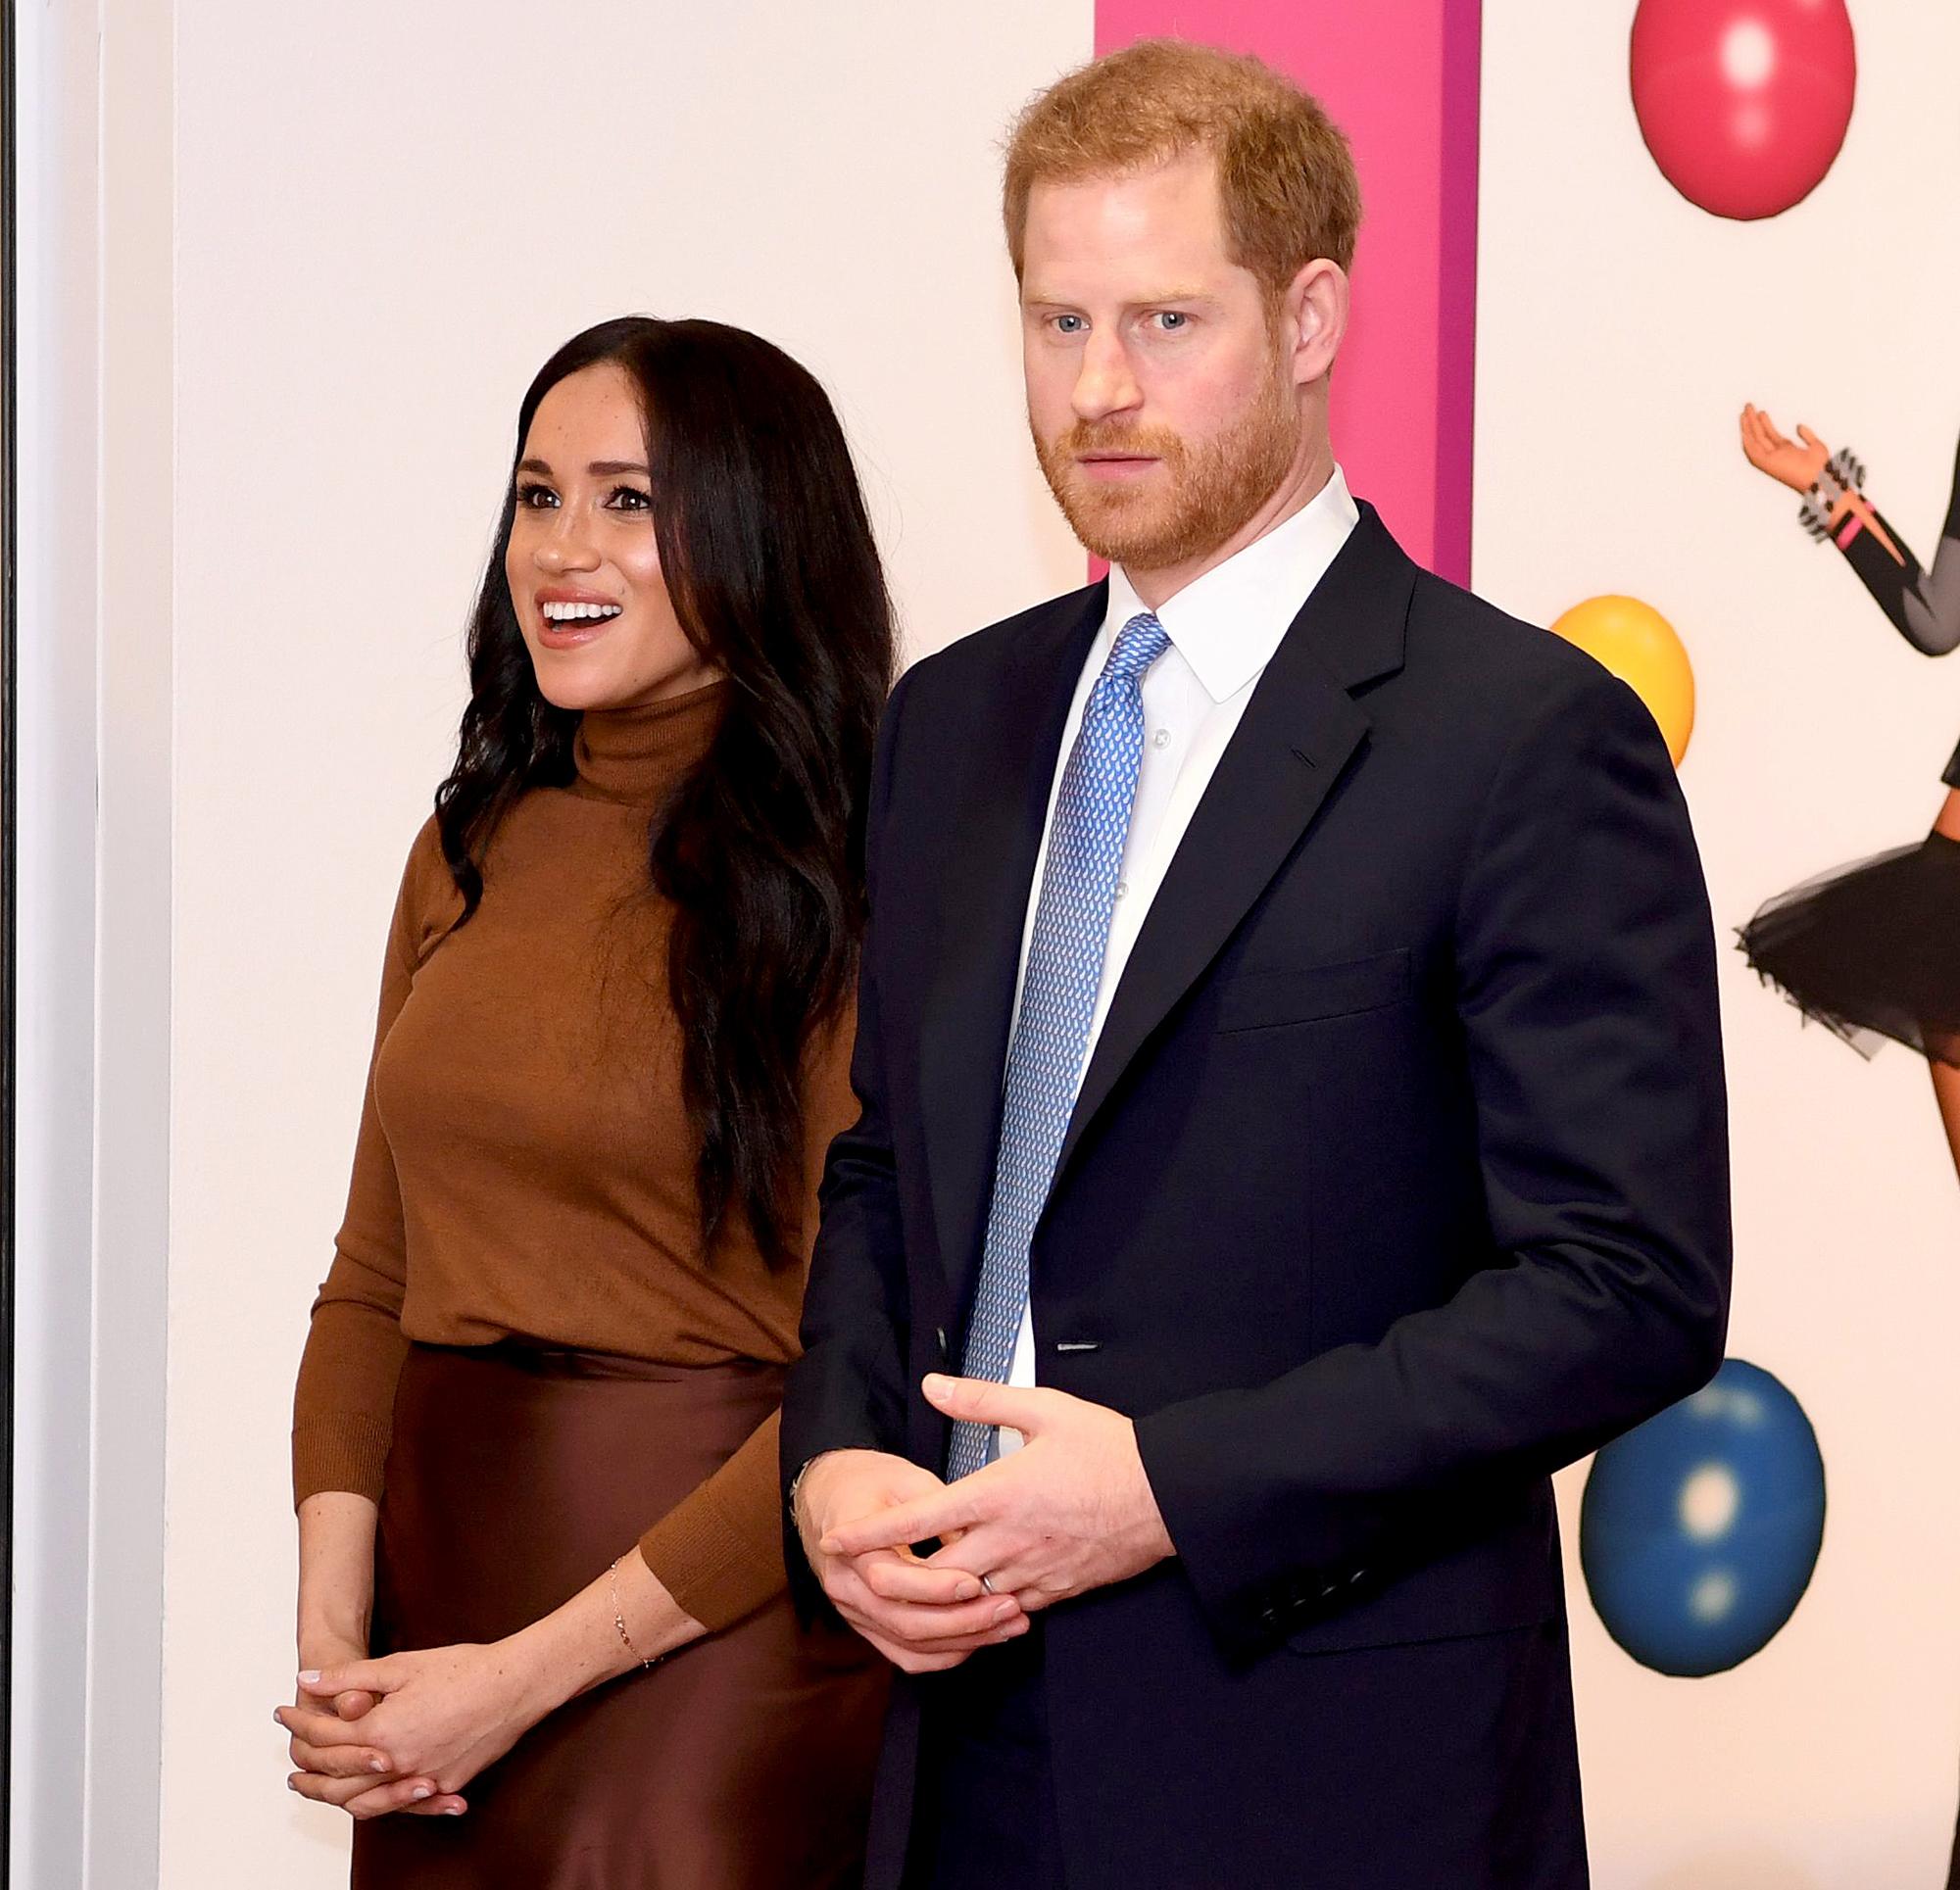 Ryan Reynolds Jokes About Prince Harry and Meghan Markle's Royal Step Back